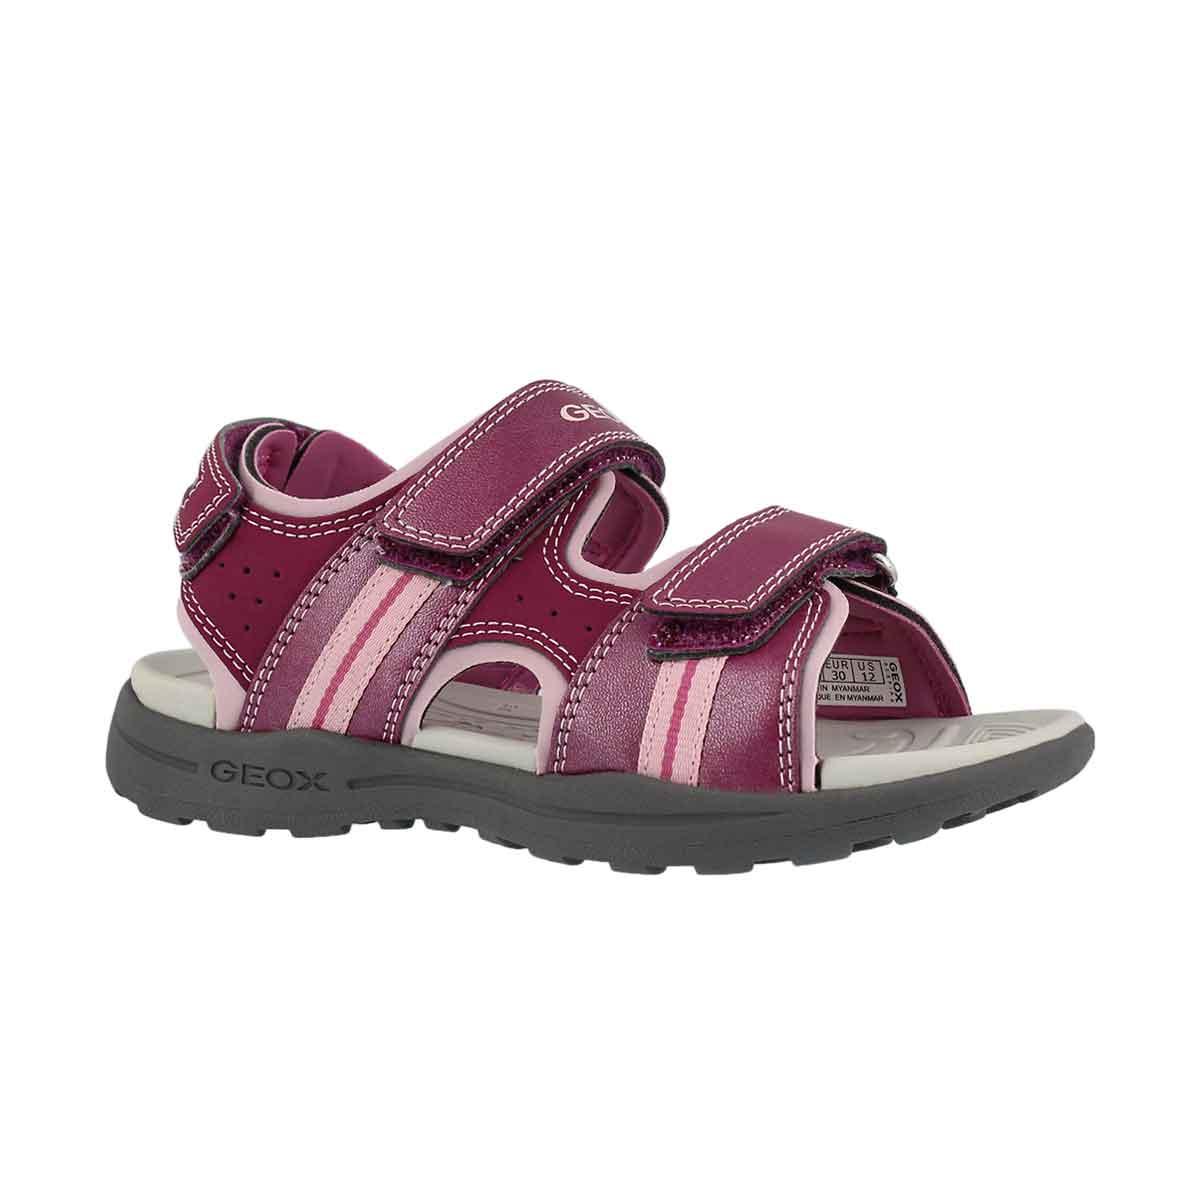 Girls' VANIETT light fuschia casual sandals